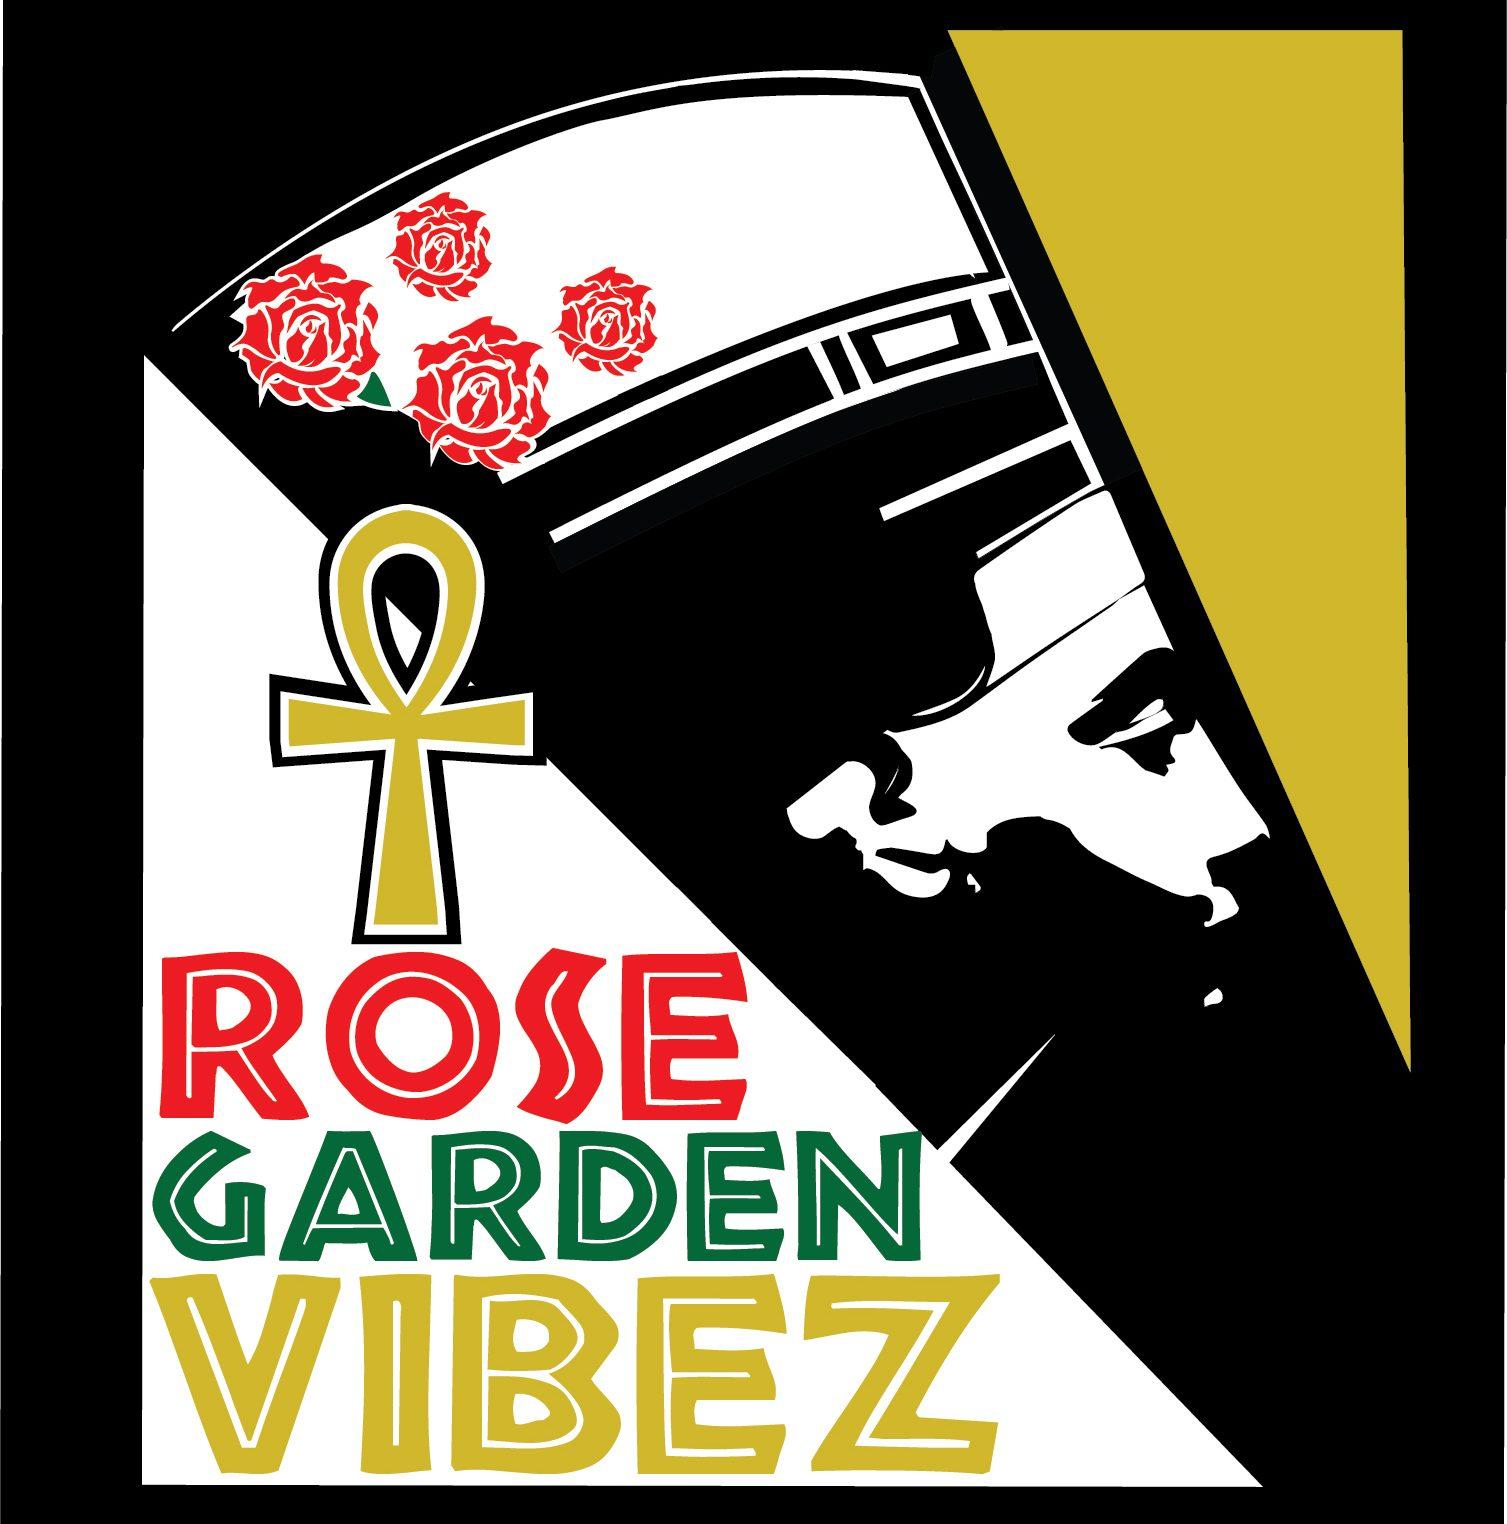 Rose Garden Vibez